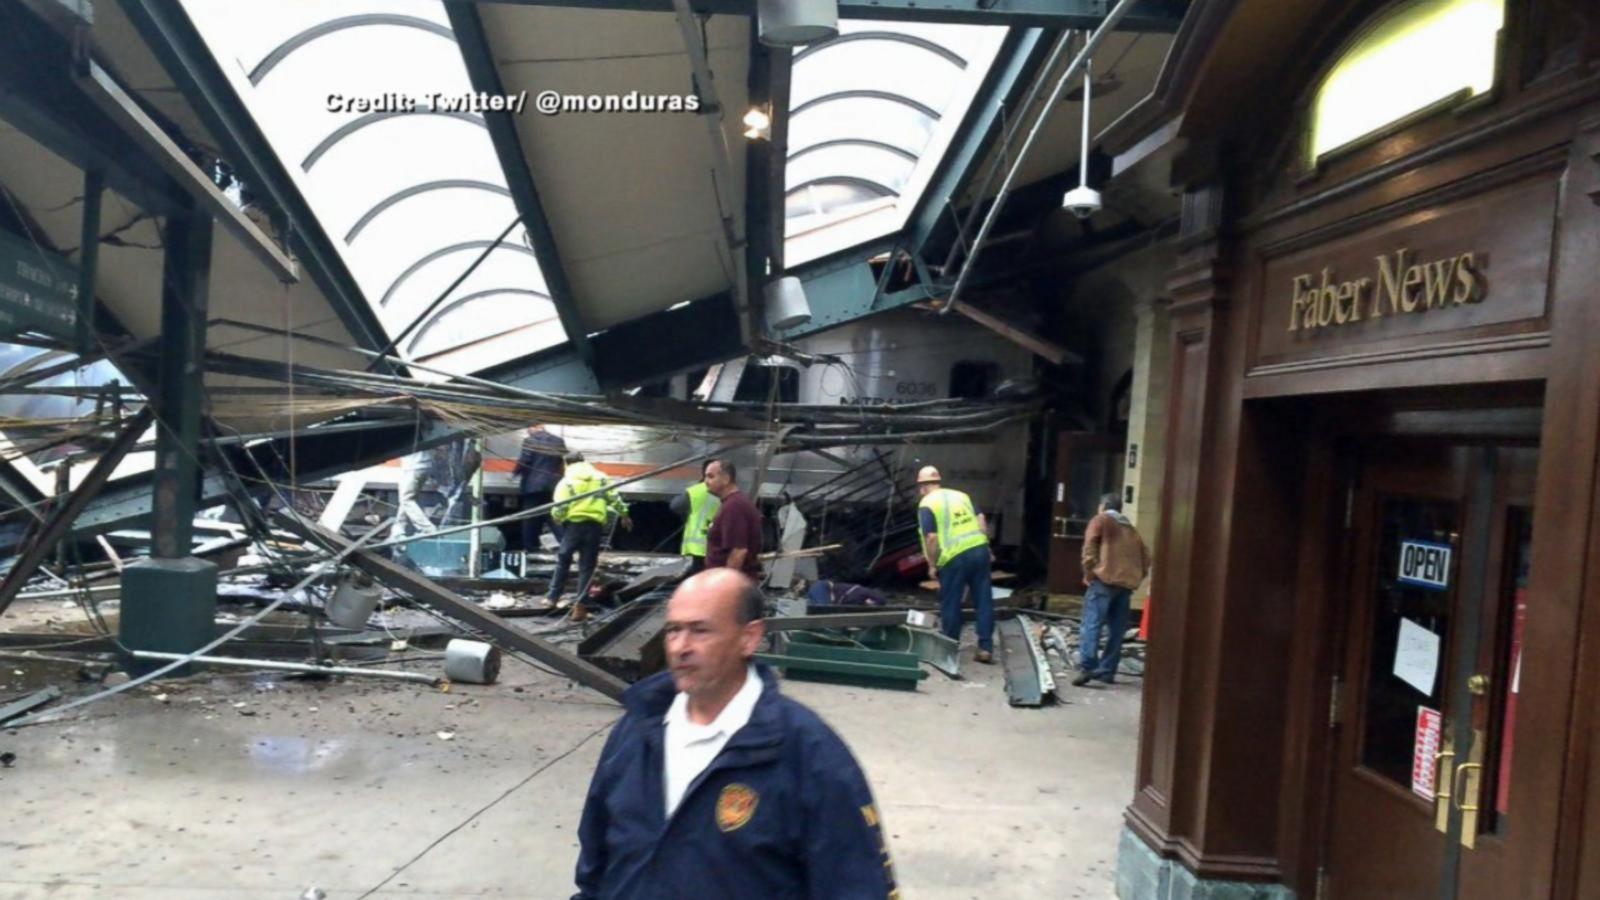 Authorities are responding to the incident in Hoboken, New Jersey.